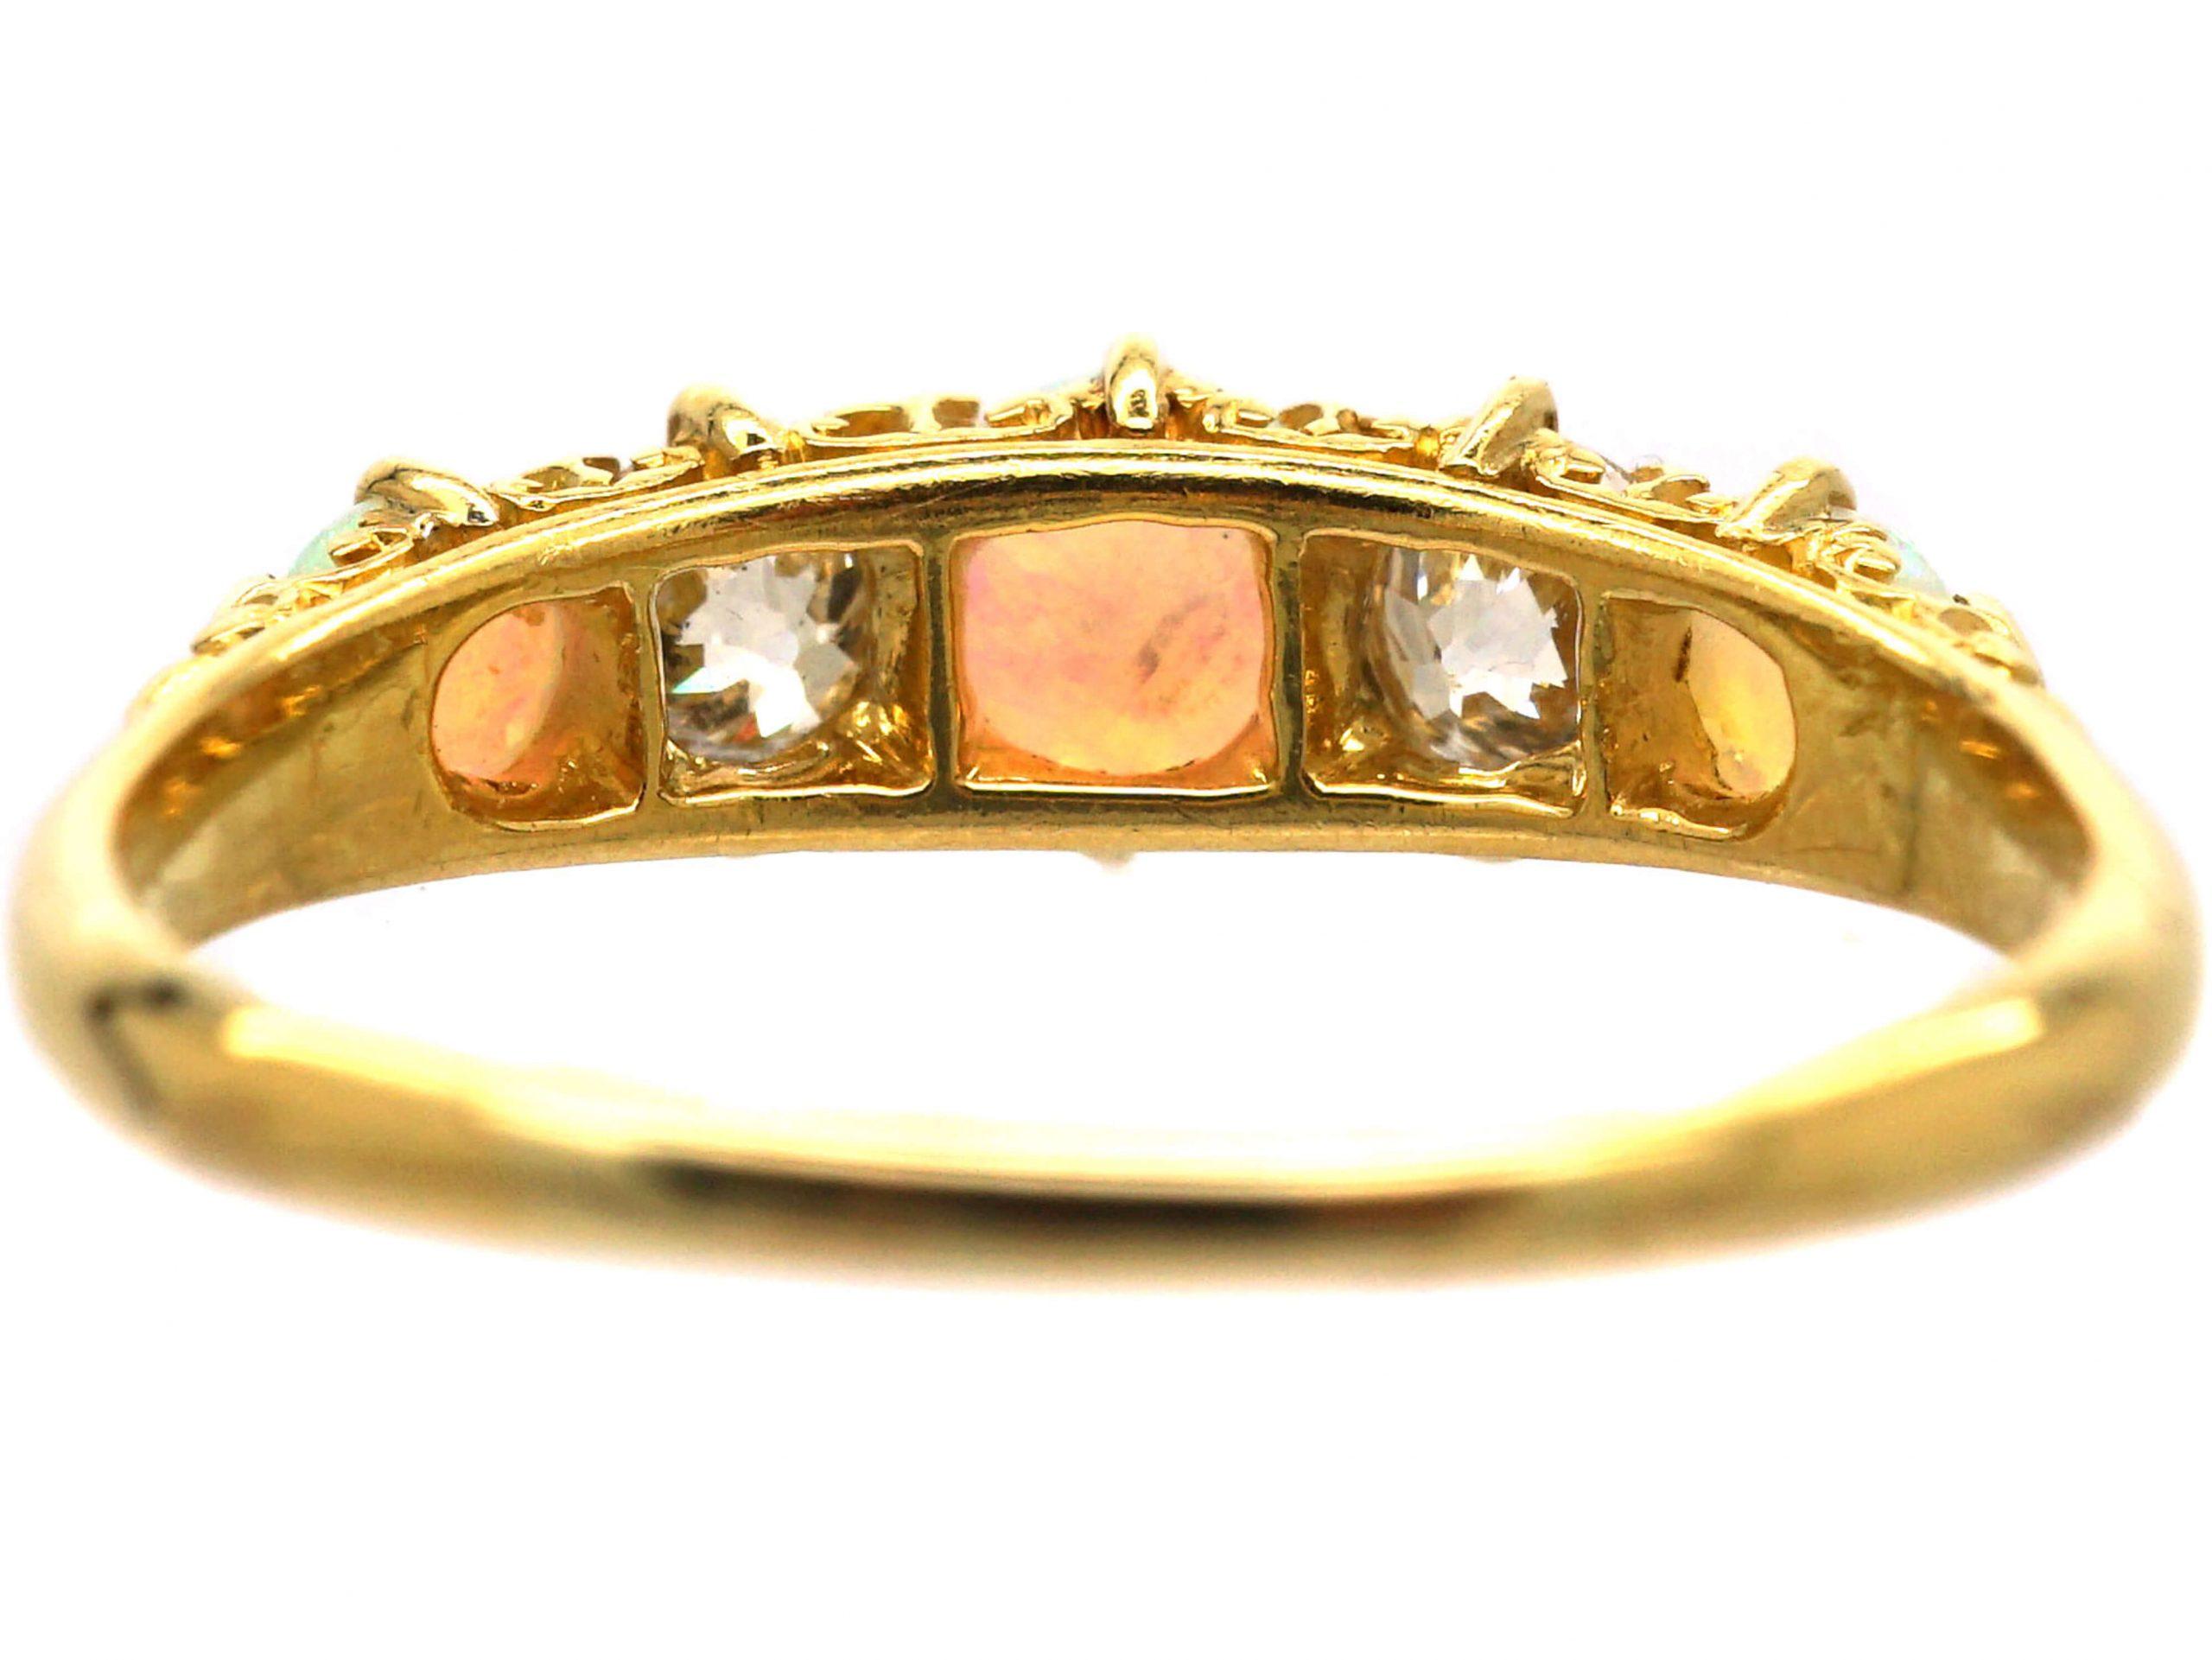 Edwardian 18ct Gold, Opal & Diamond Five Stone Ring